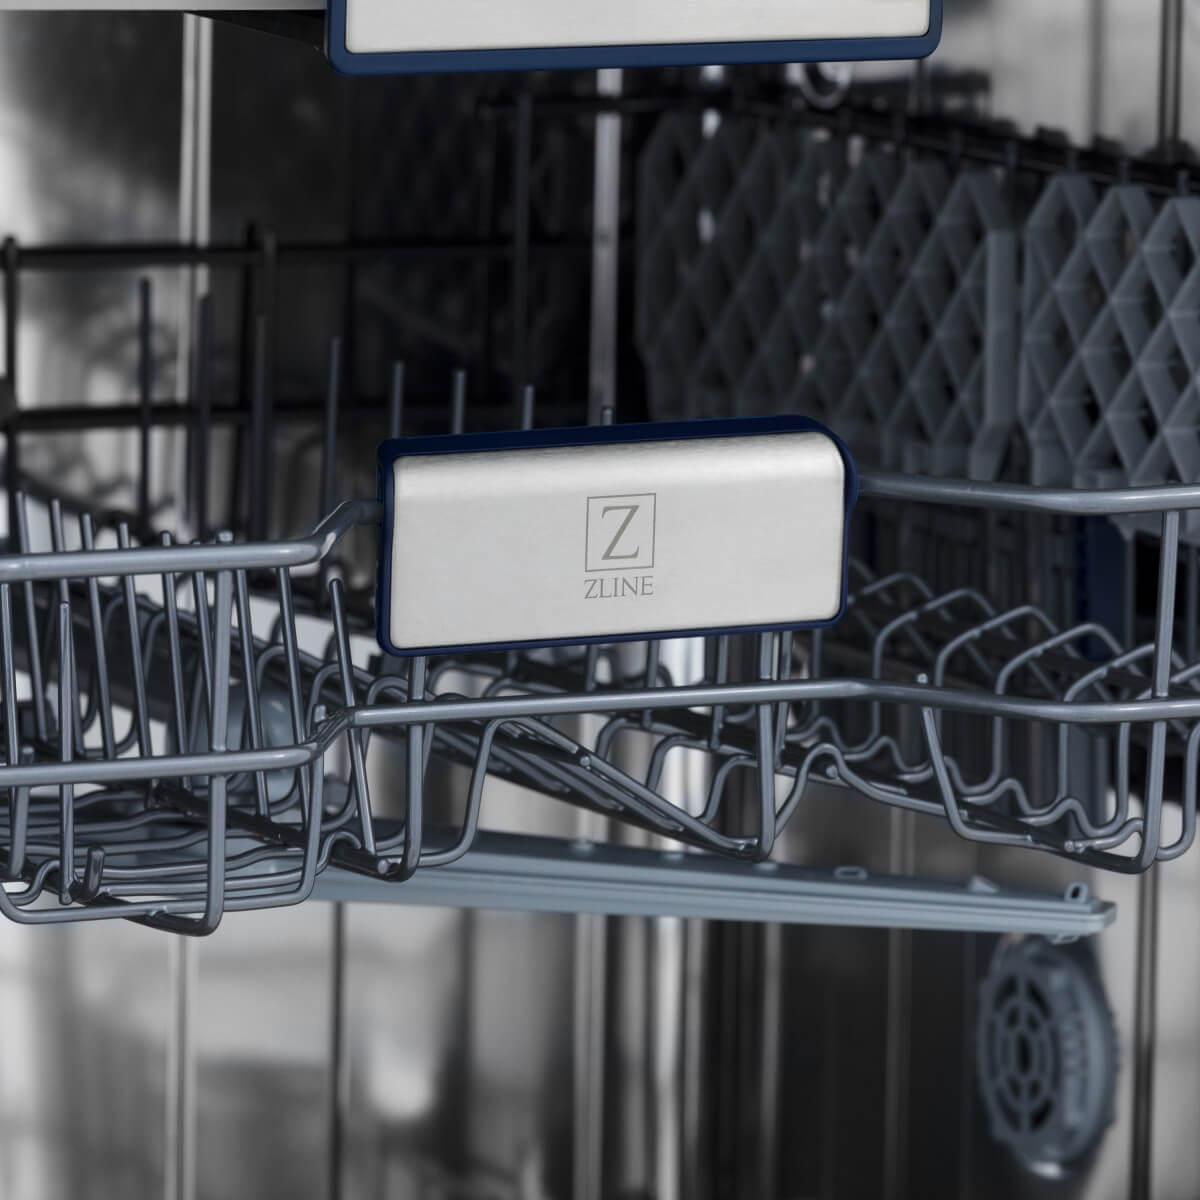 3rd rack dishwasher